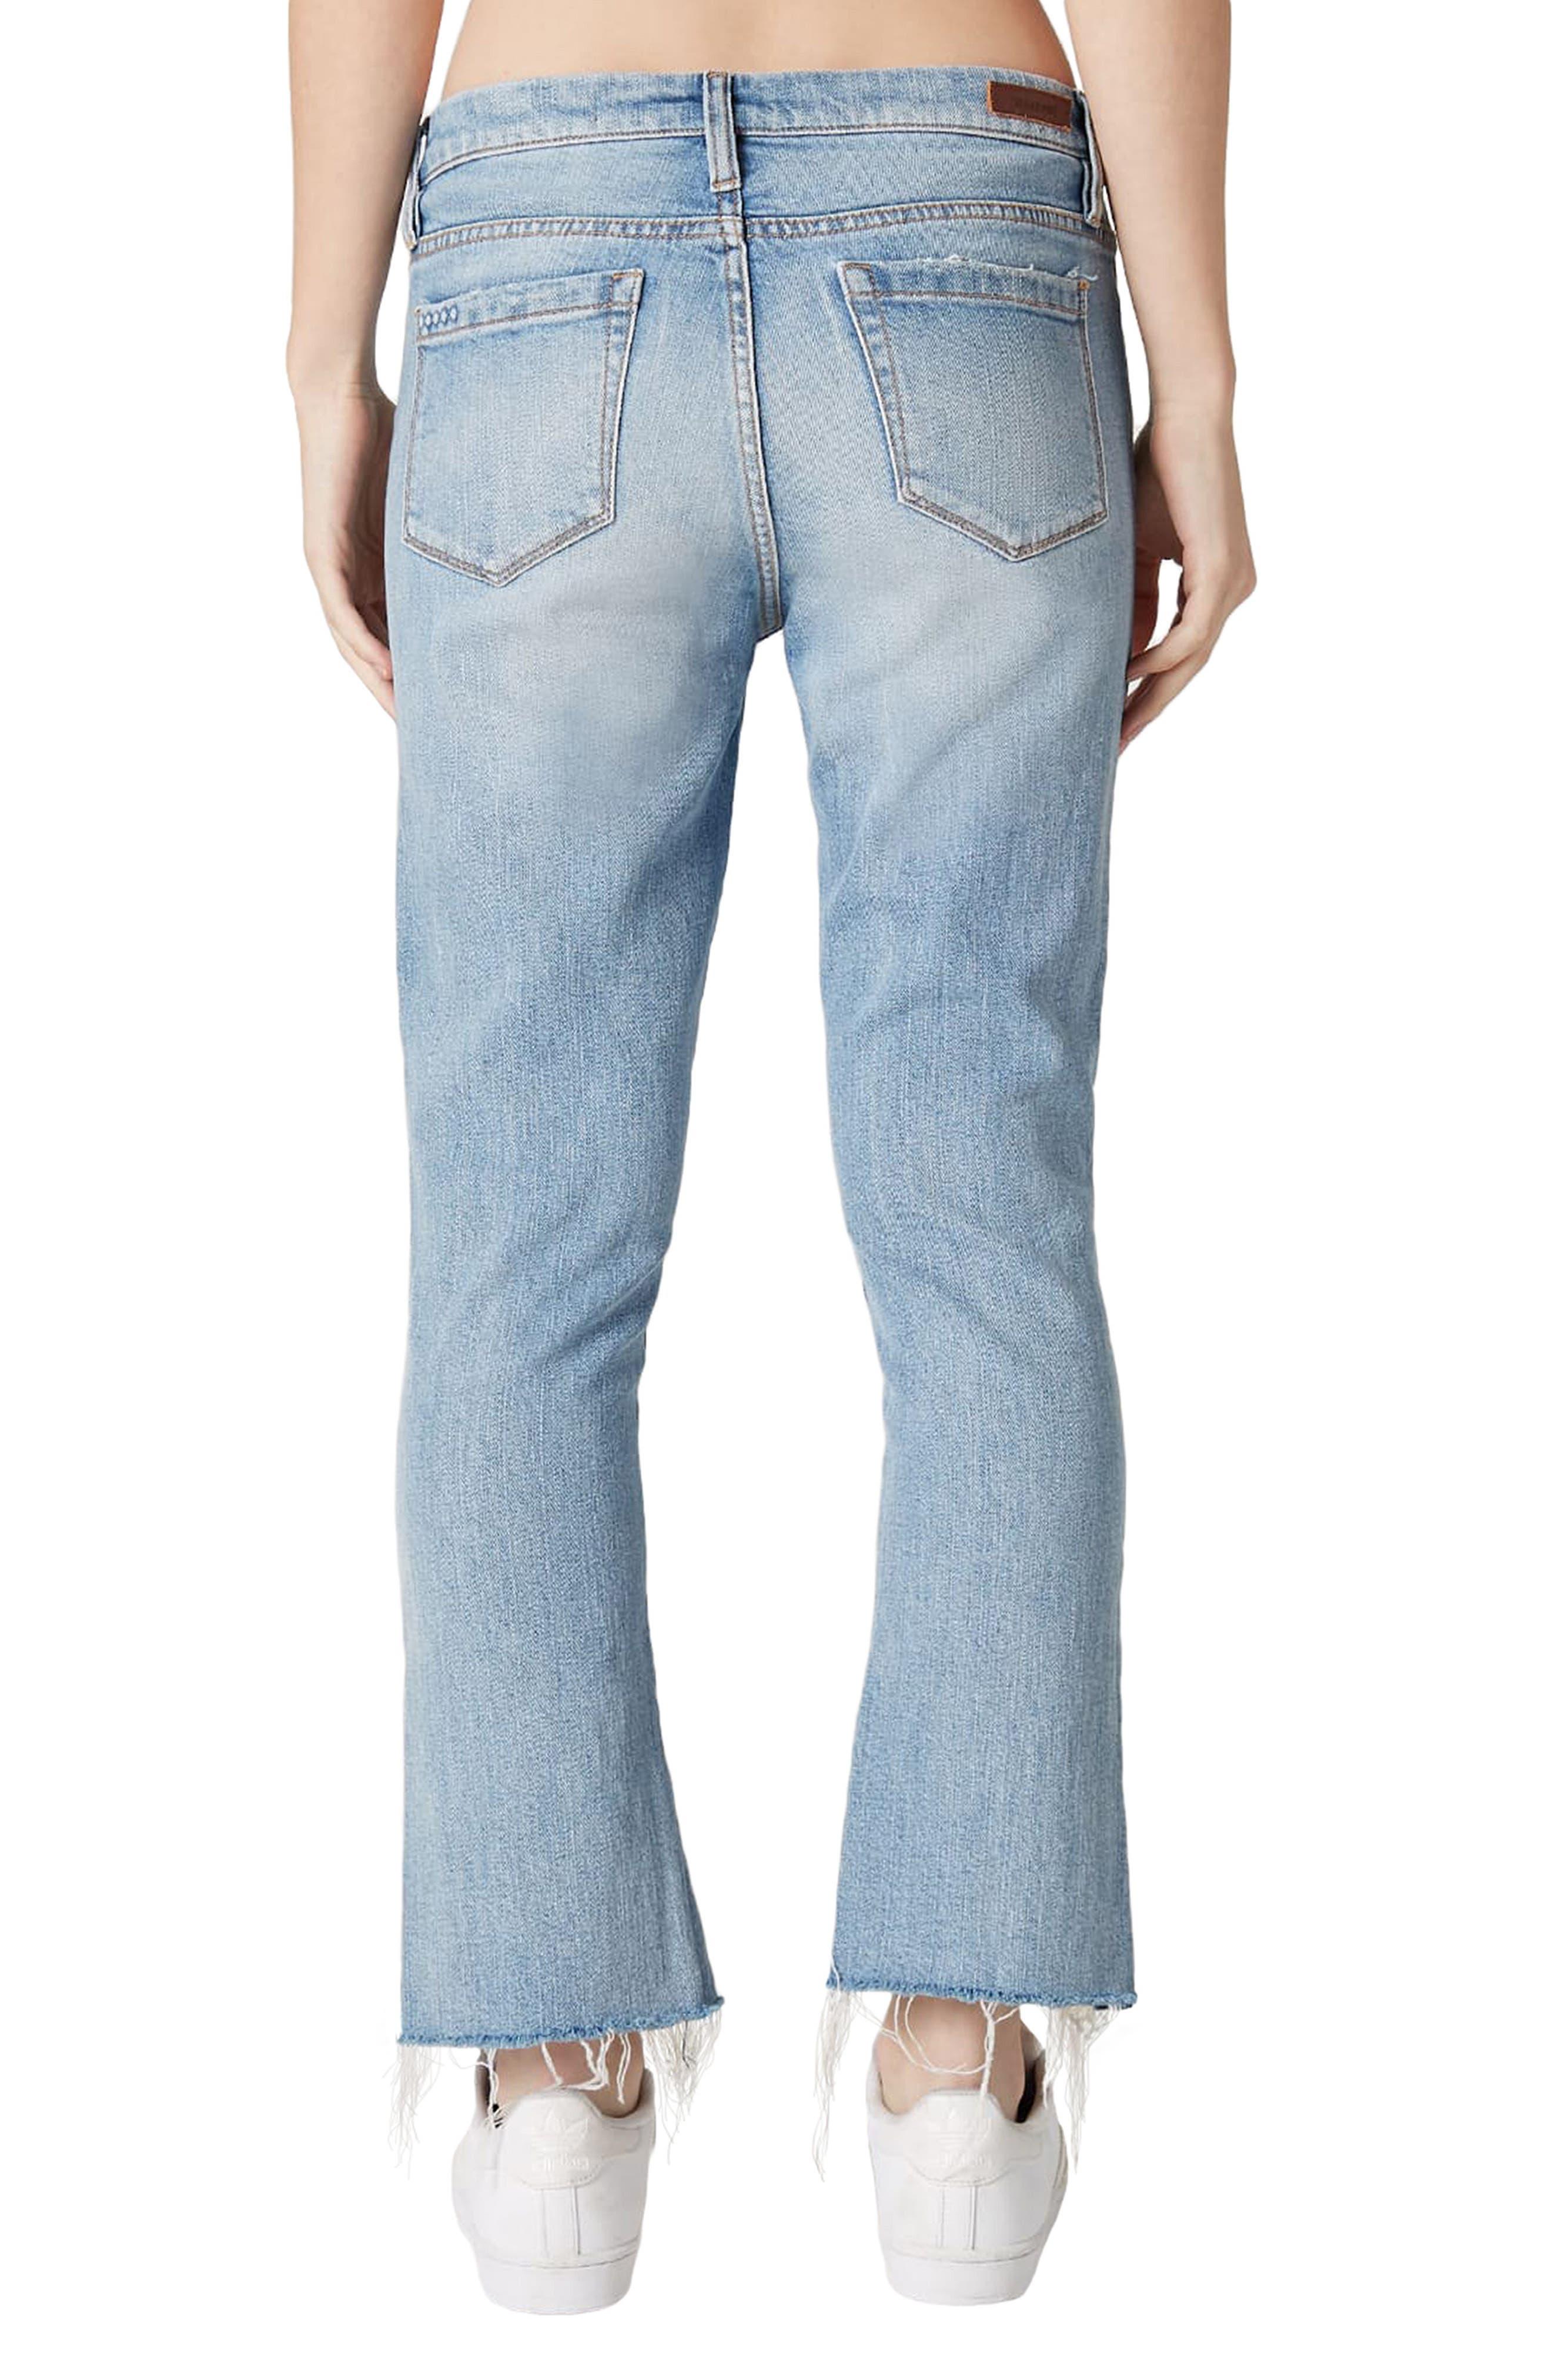 Constant Convo Distressed Hem Jeans,                             Alternate thumbnail 2, color,                             400